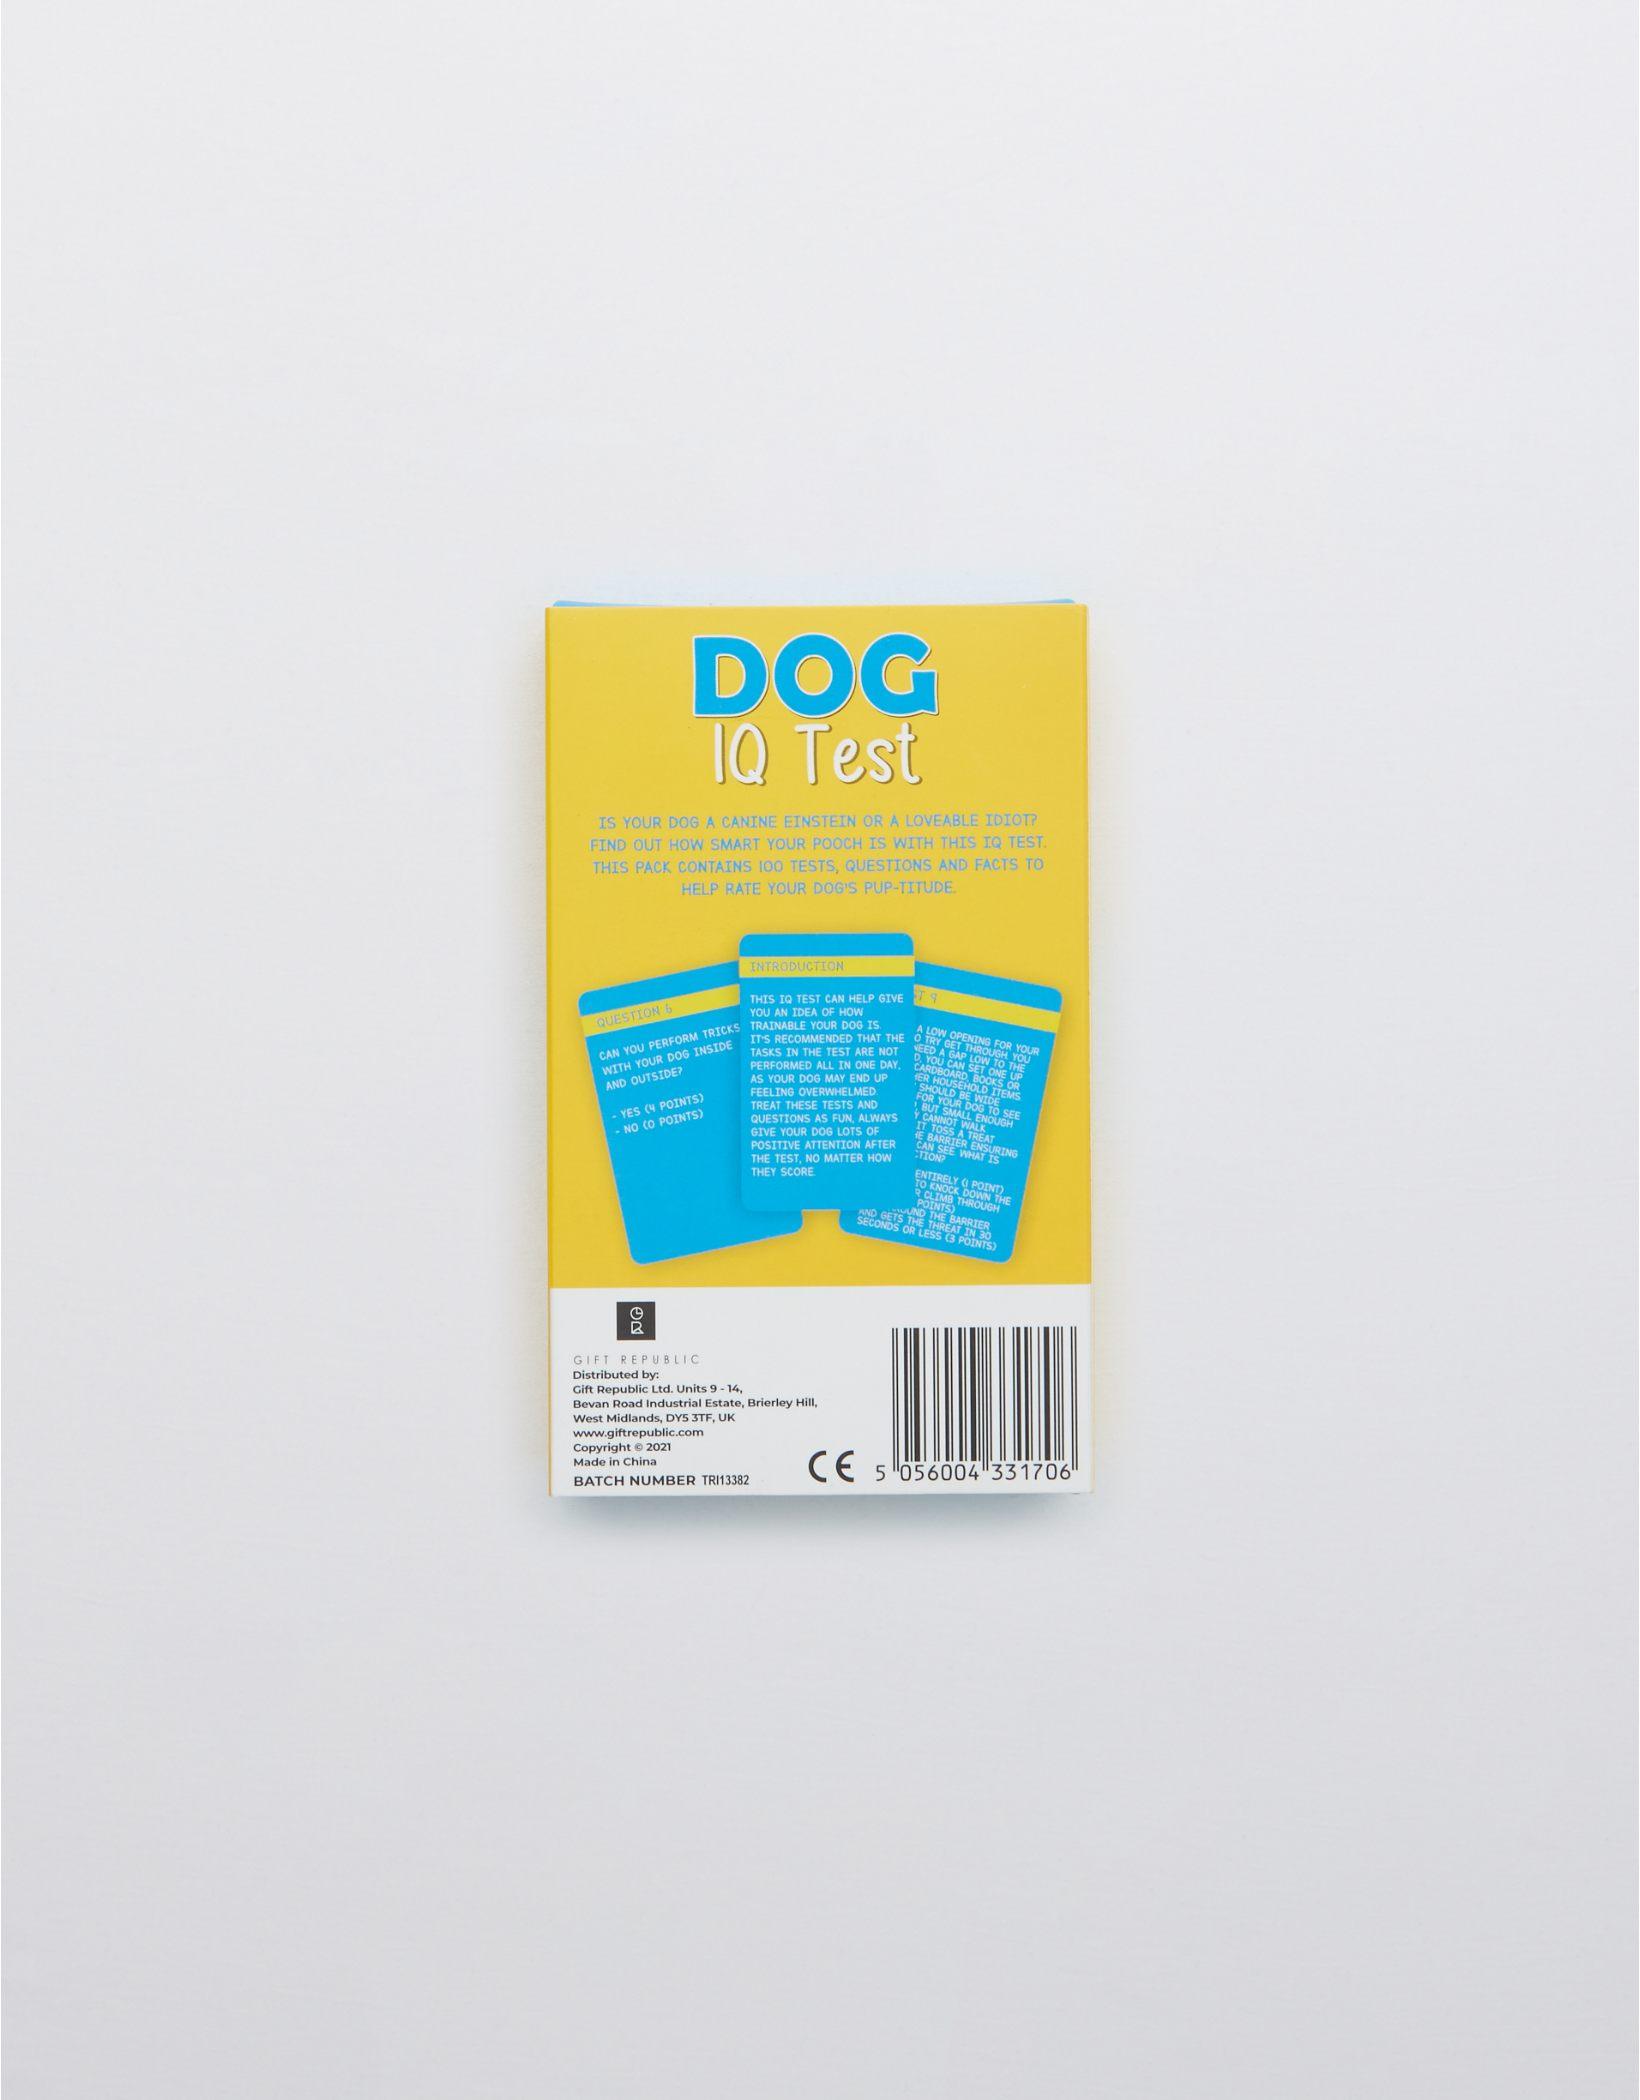 Dog IQ Test Cards